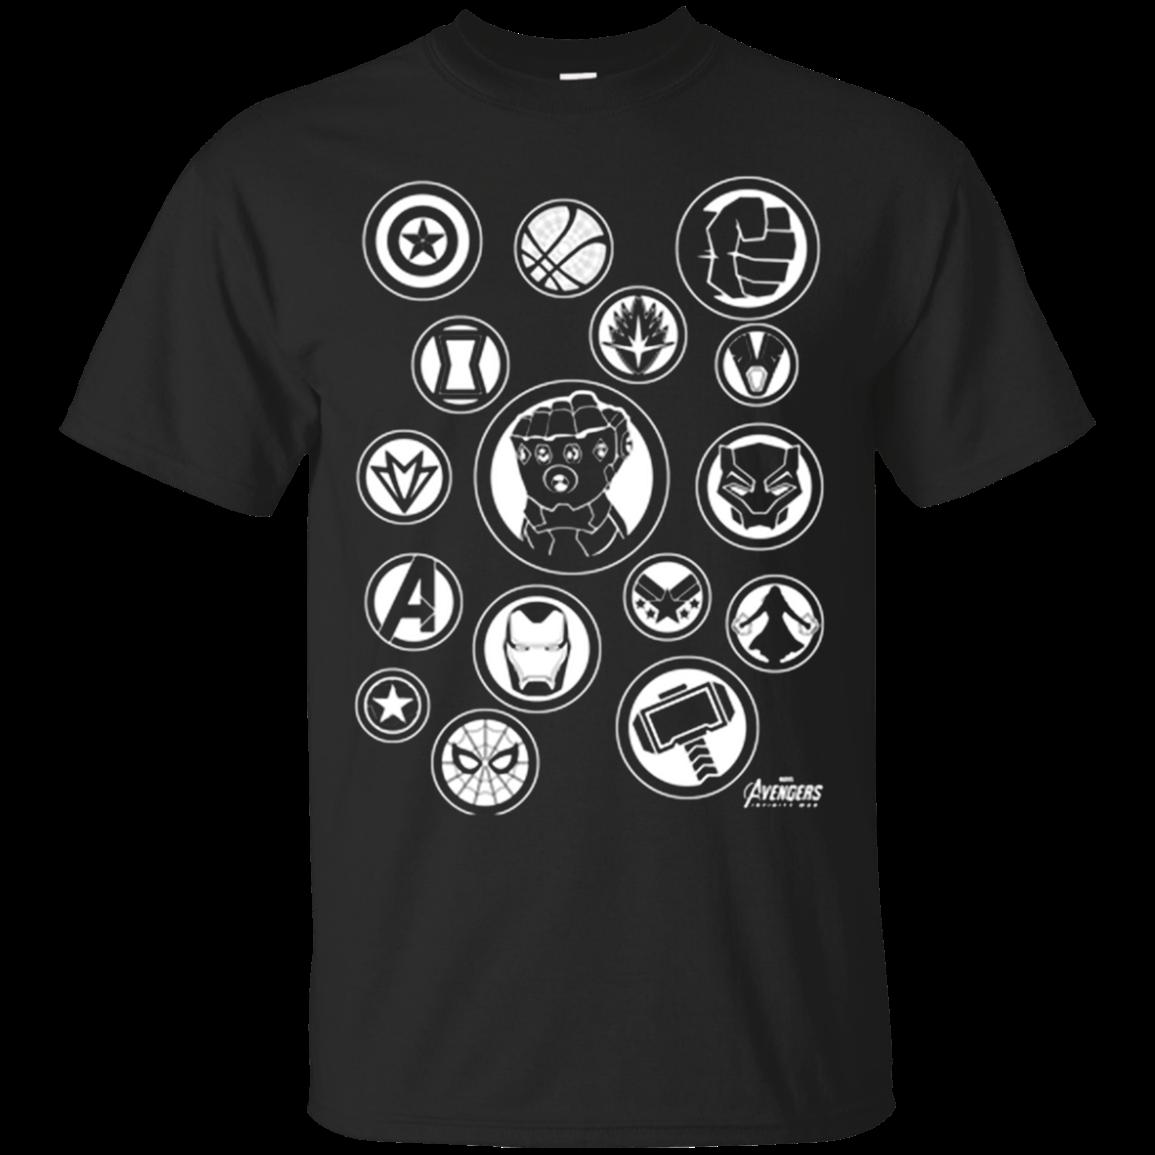 Avengers Infinity War Hero Icon Cotton T Shirt Men